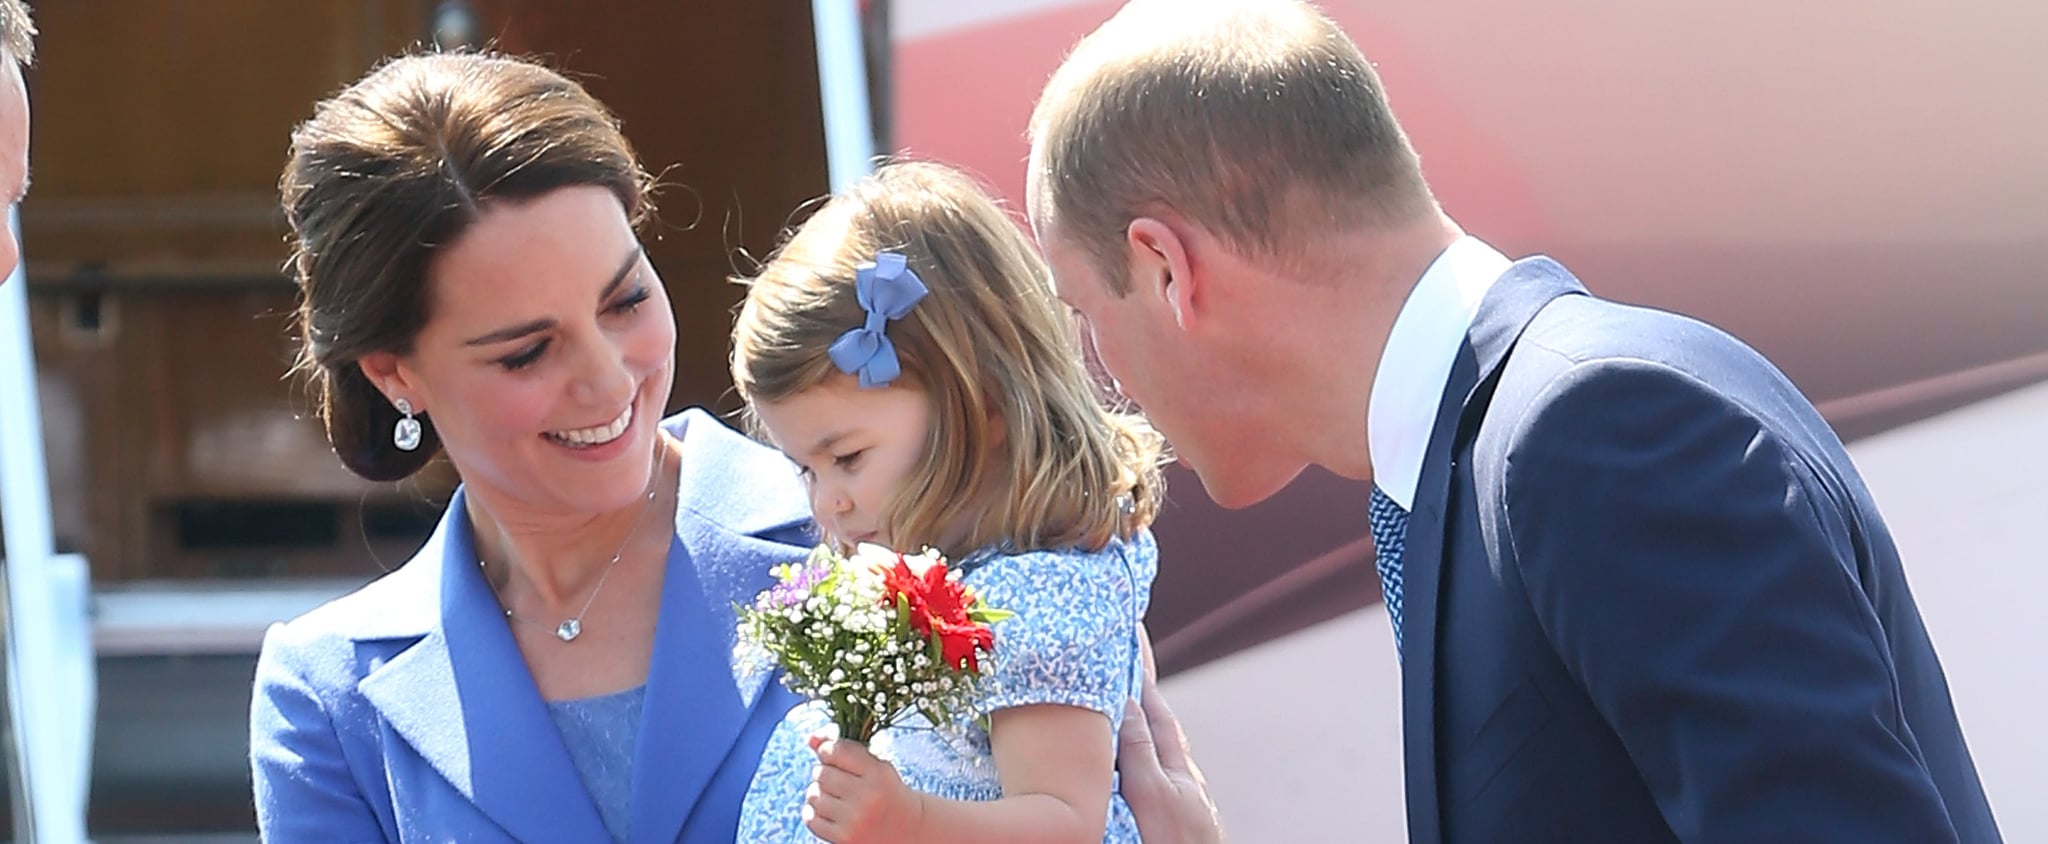 Is Prince William Calling Princess Charlotte Mignonette?